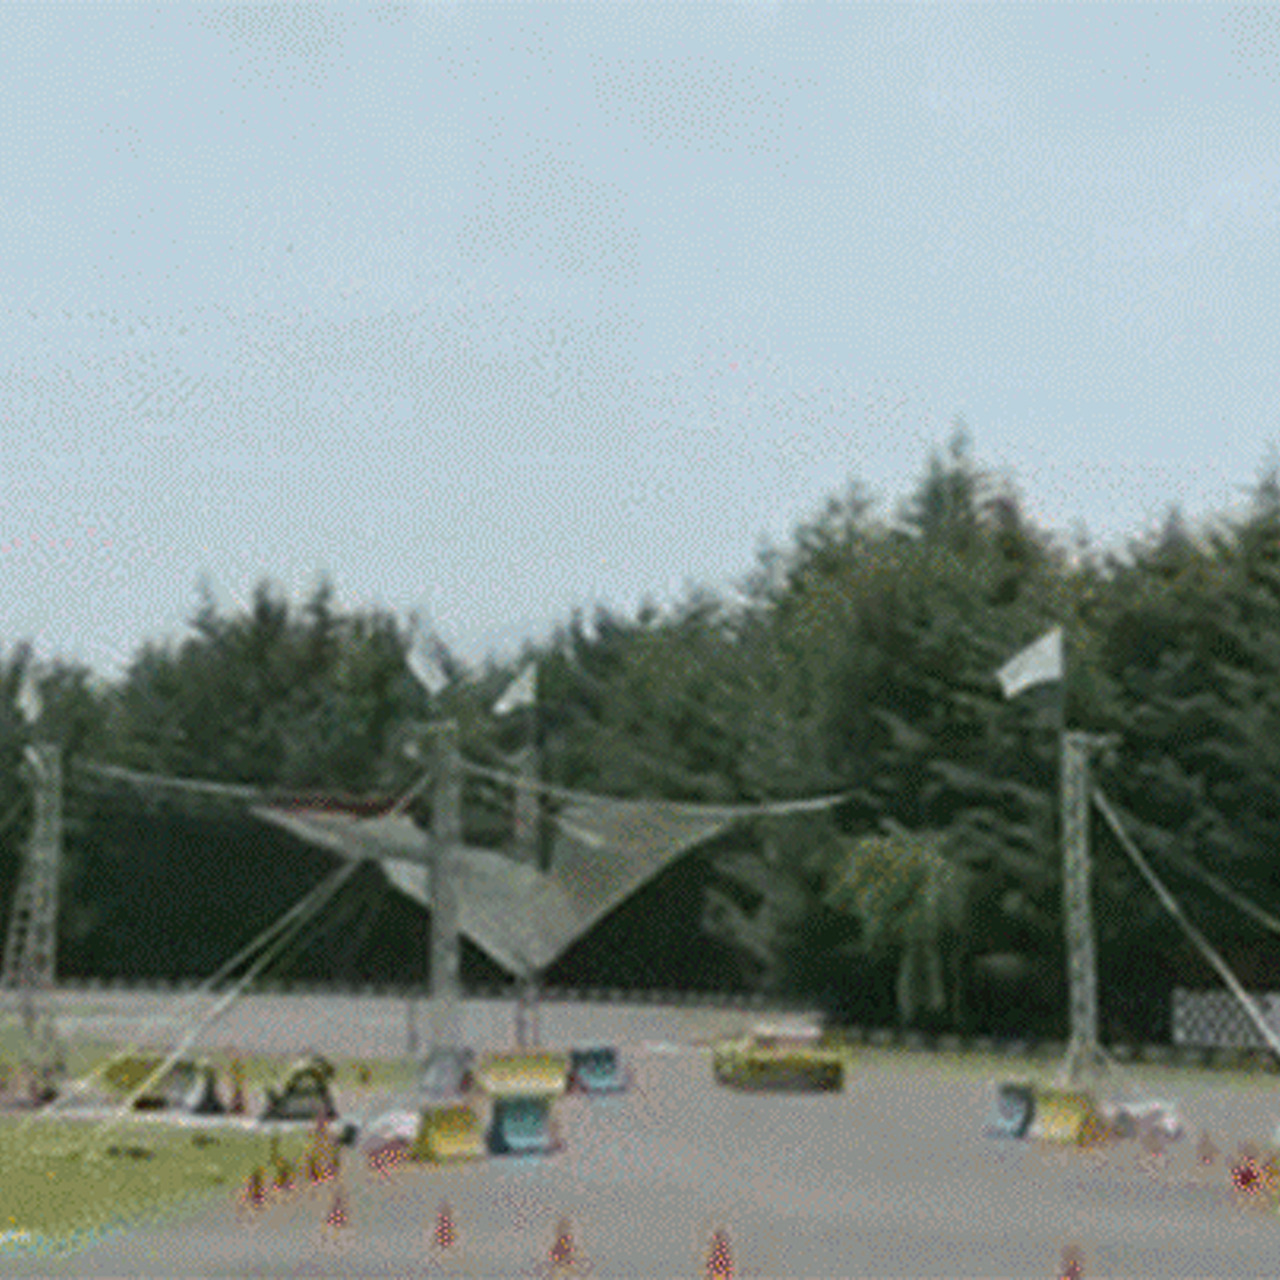 Watch a Corvette Z06 Release a Net That Catches a Human Cannonball